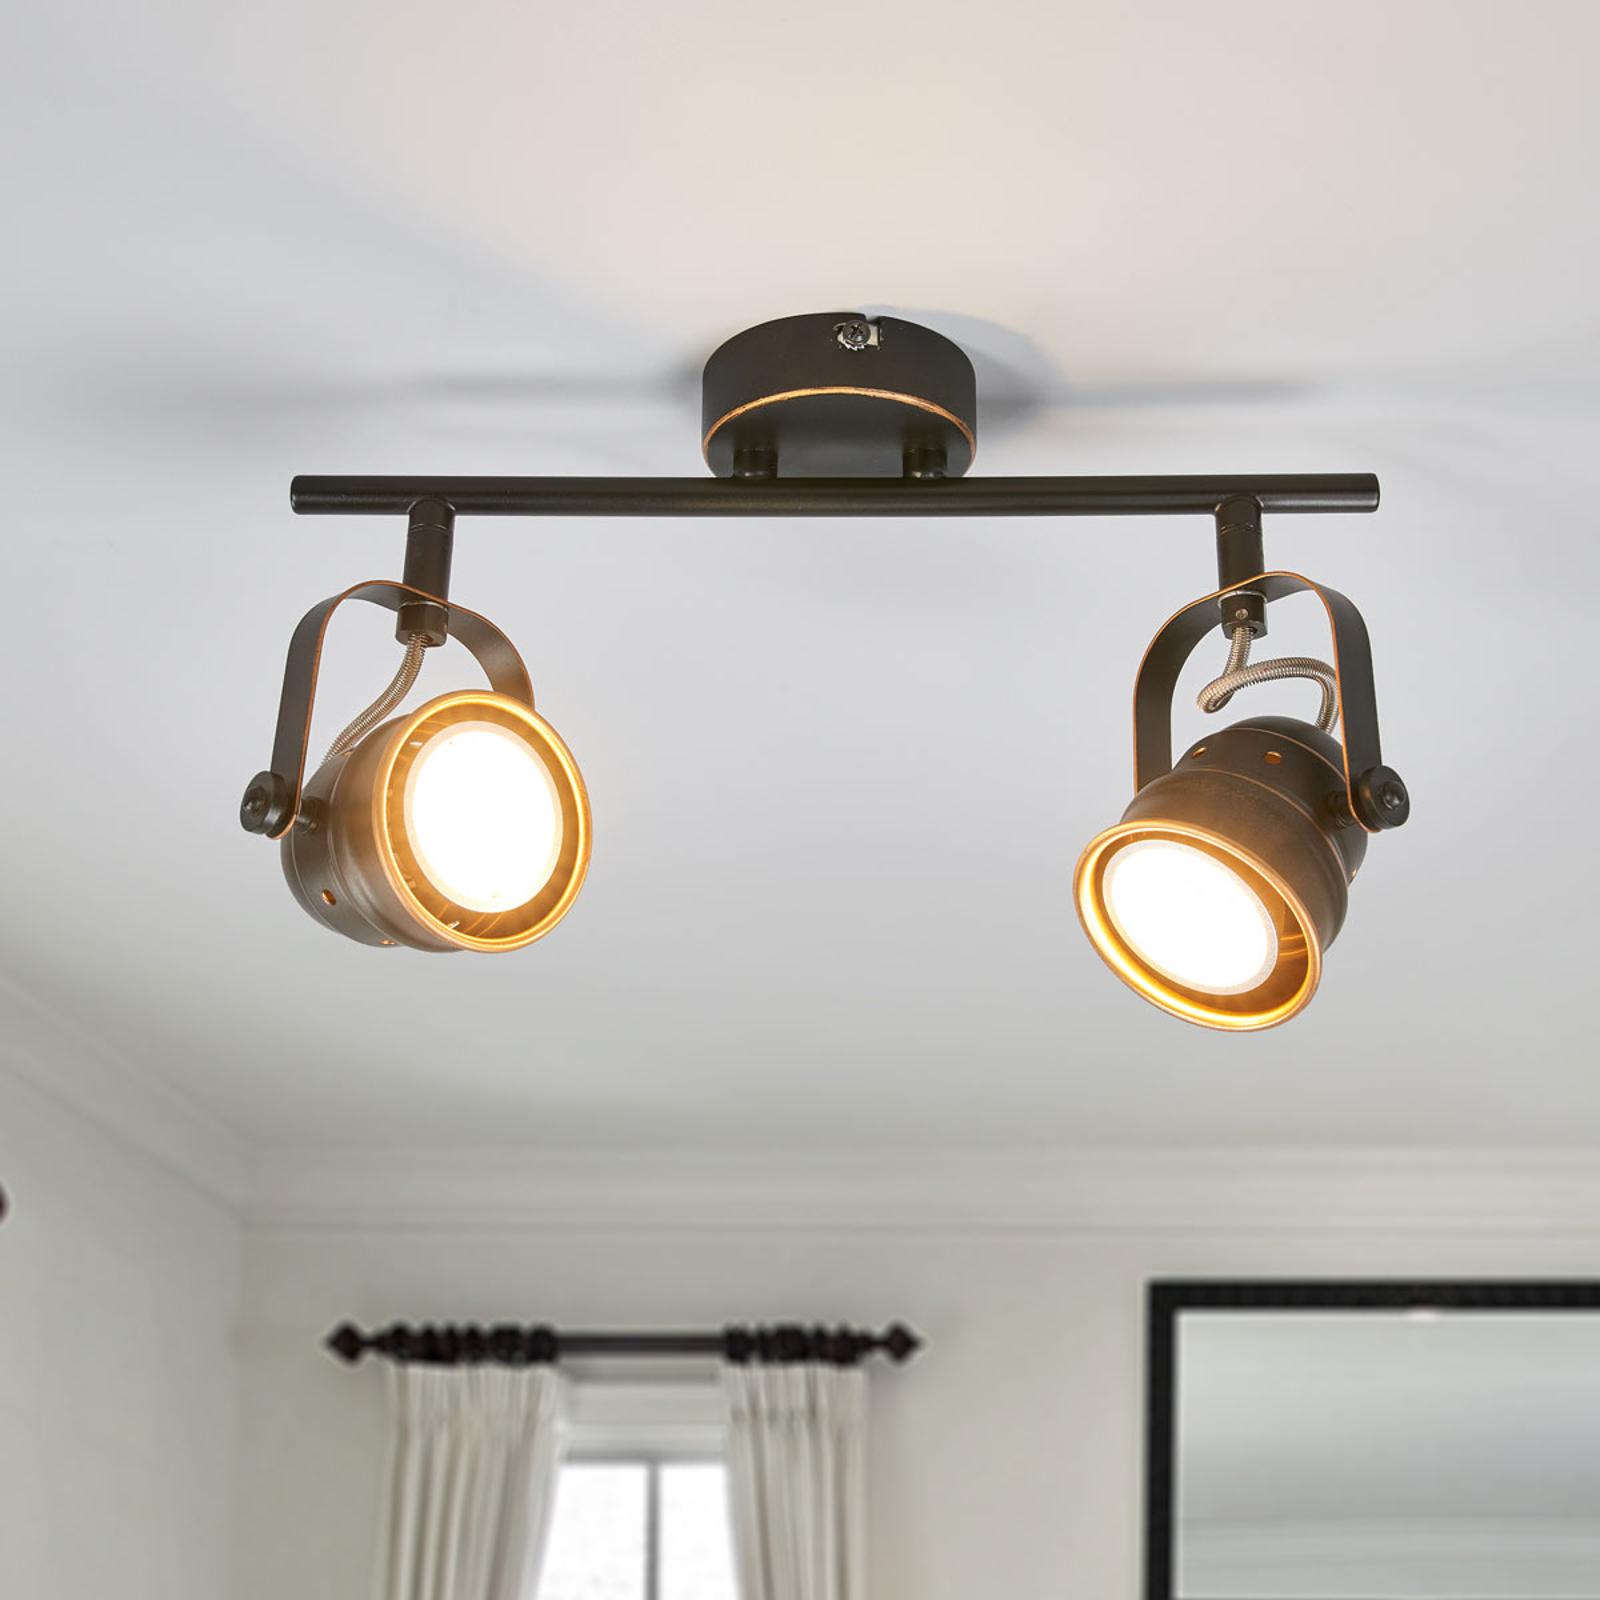 Lampa sufitowa LED GU10 Leonor, czarny izłoty